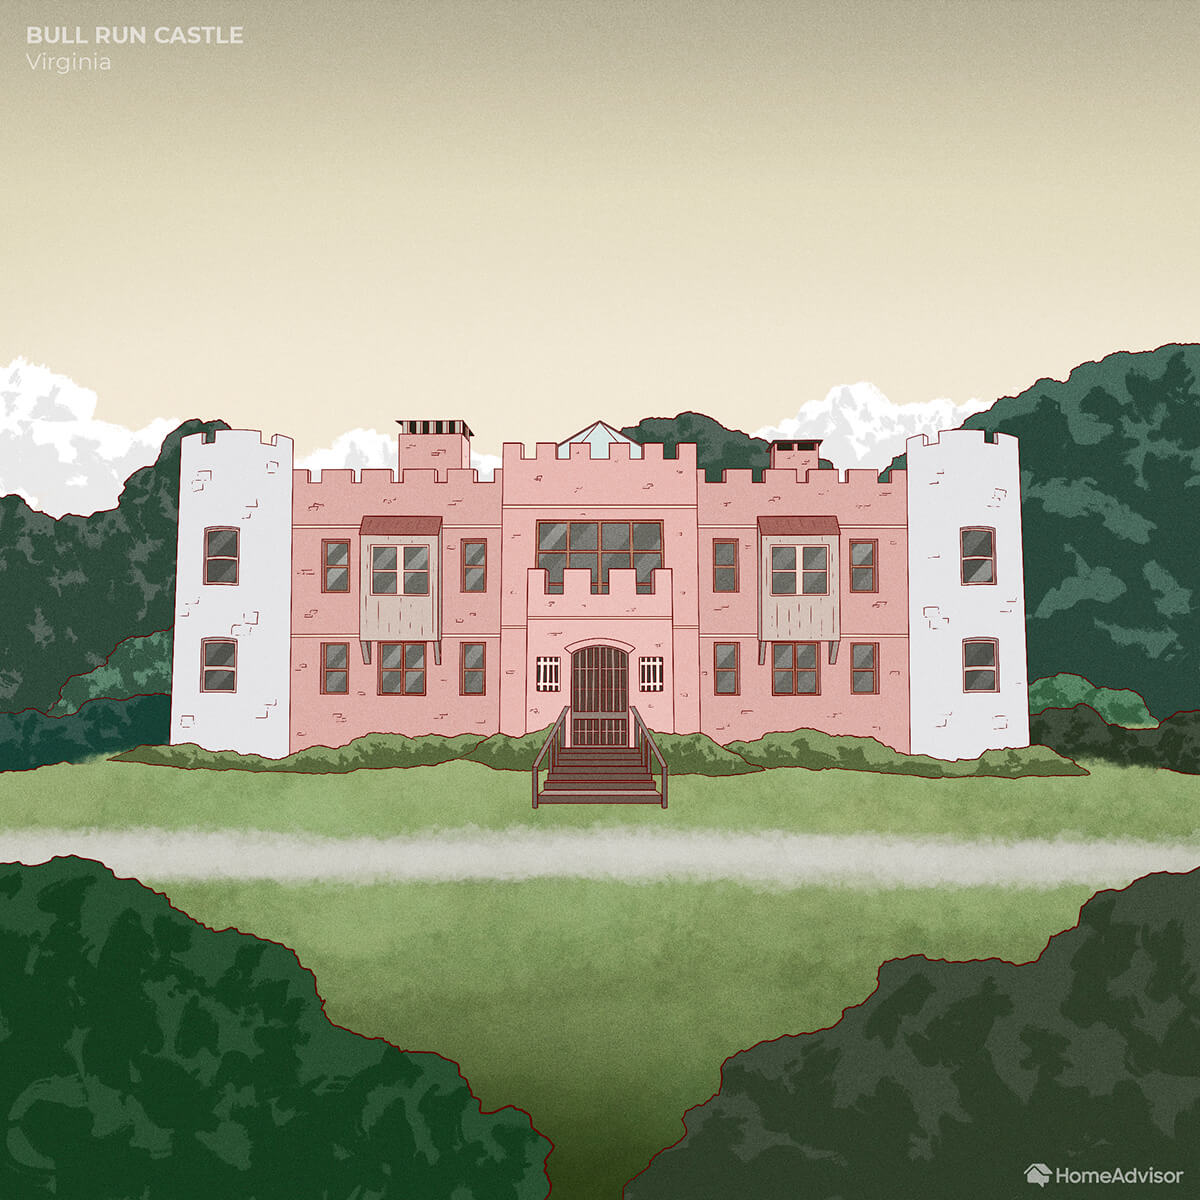 Bull Run Castle